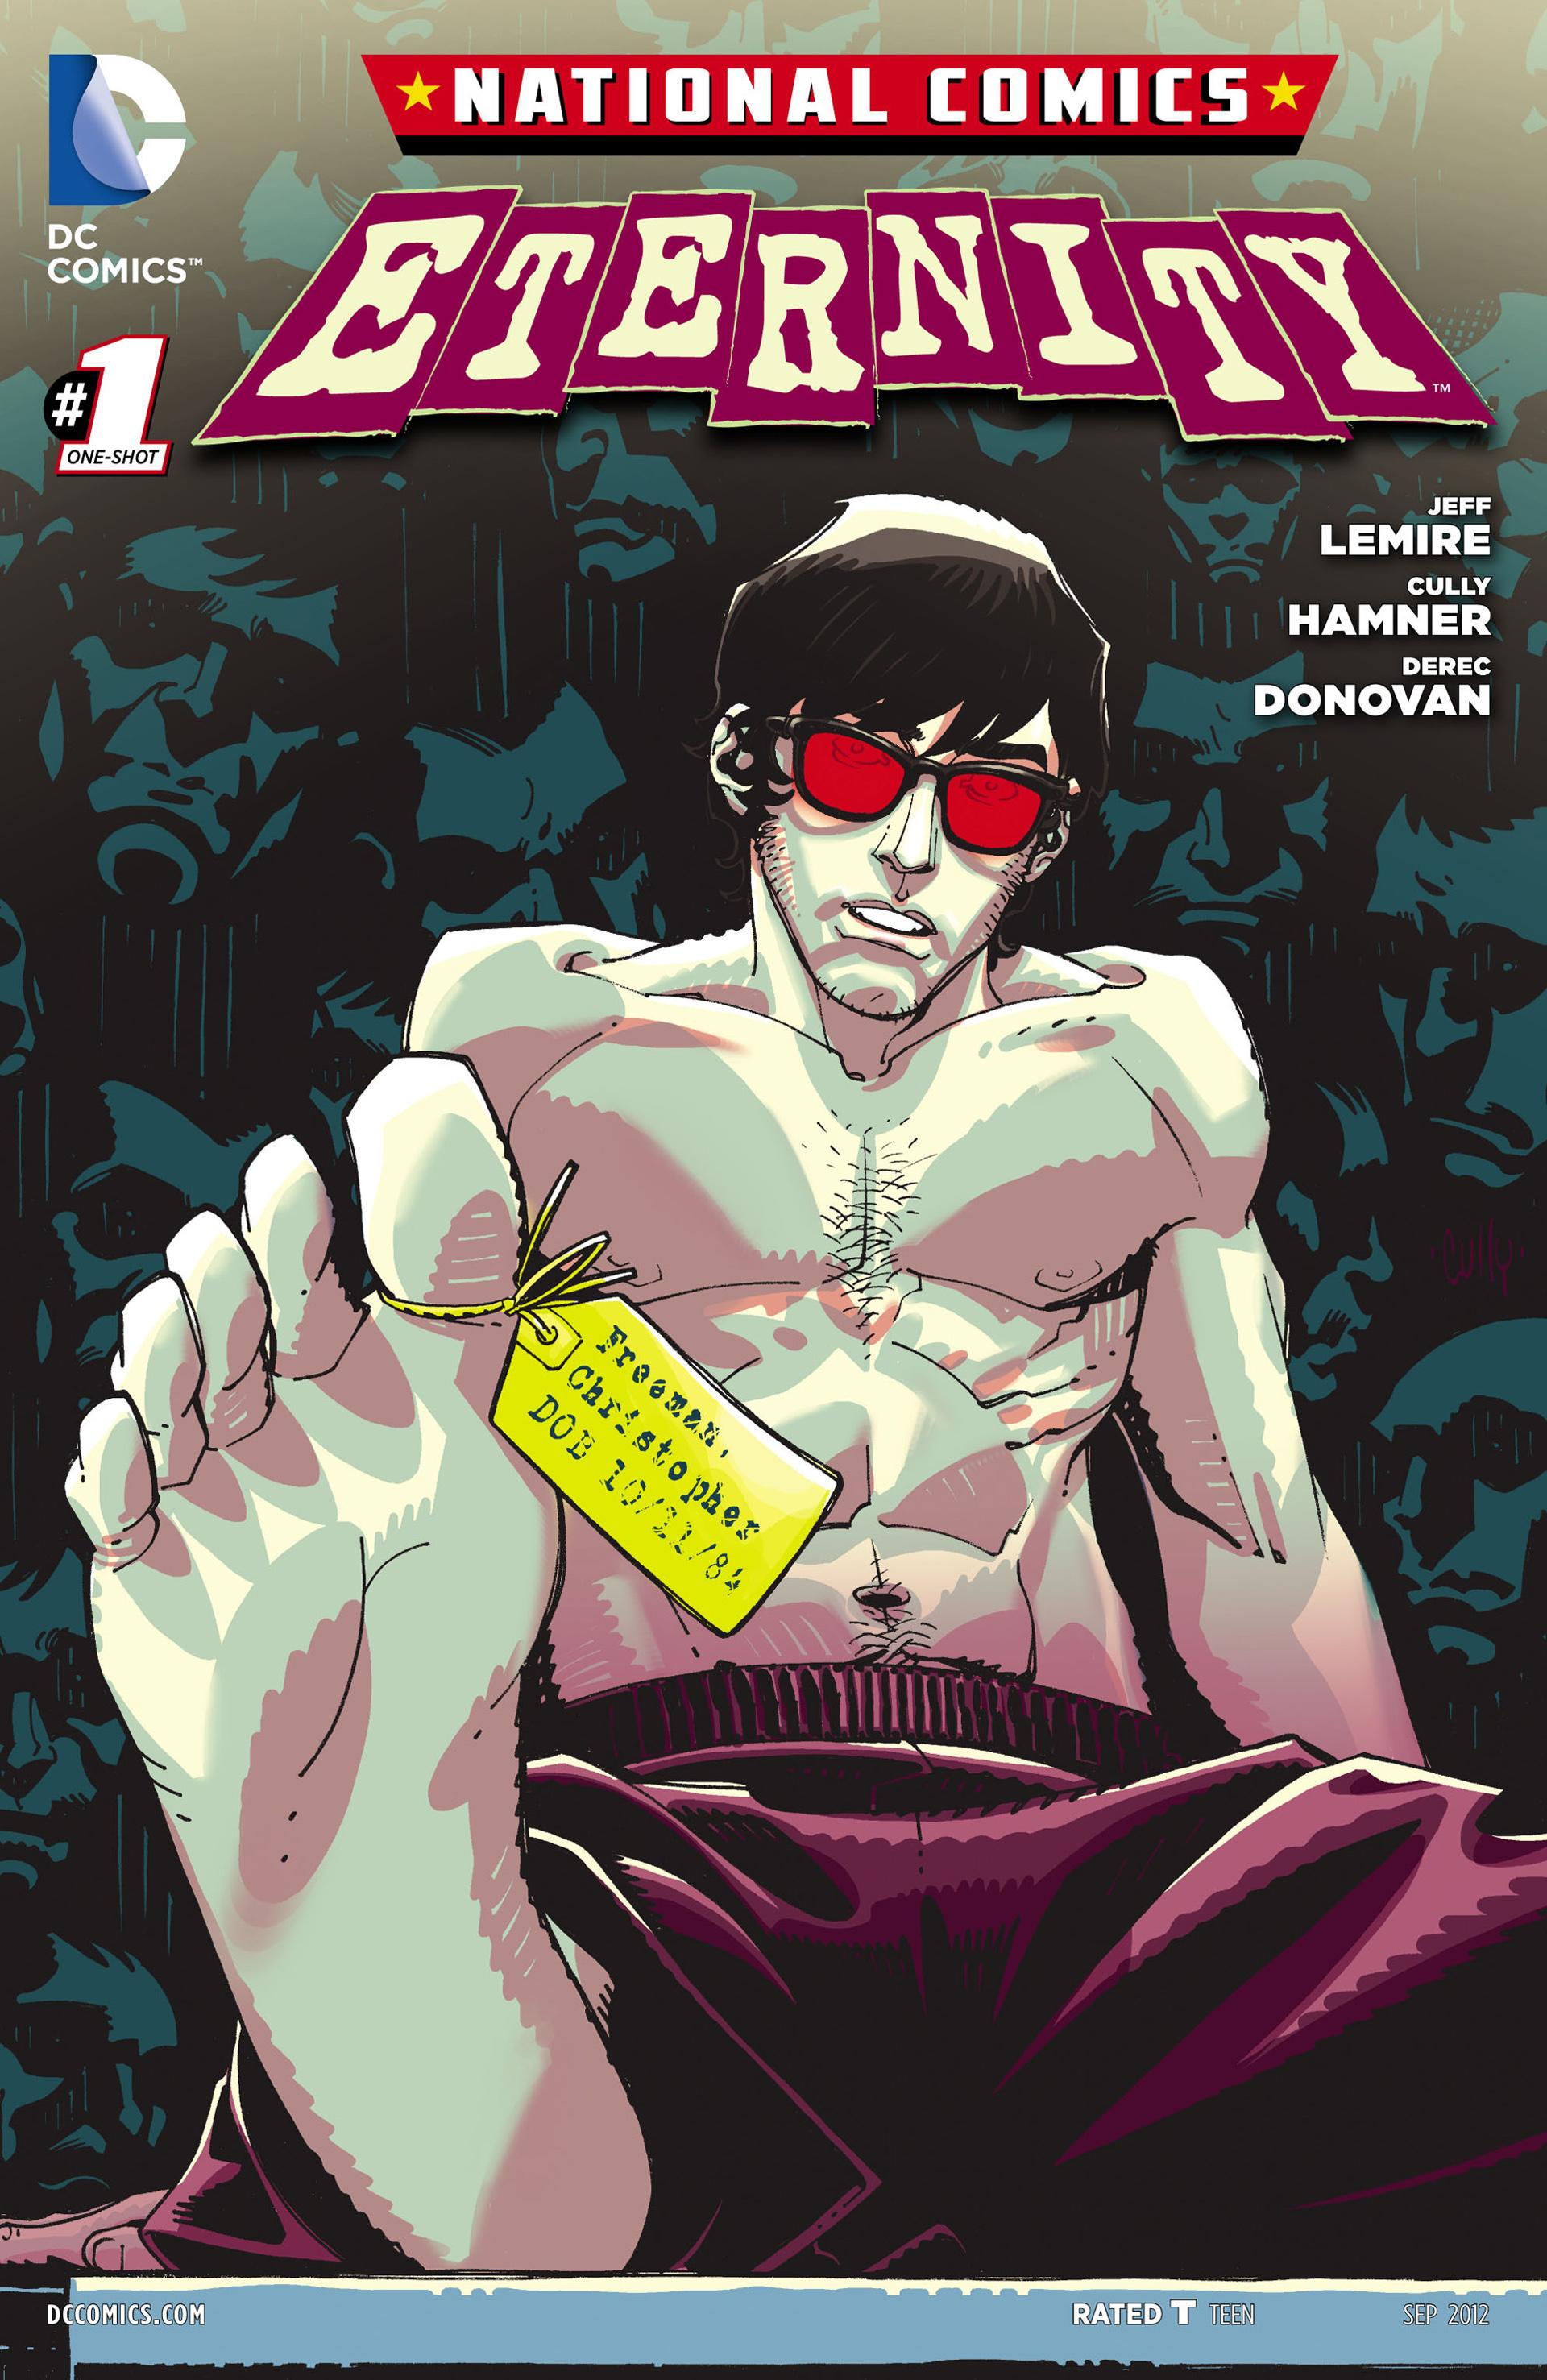 Read online National Comics: Eternity comic -  Issue # Full - 1